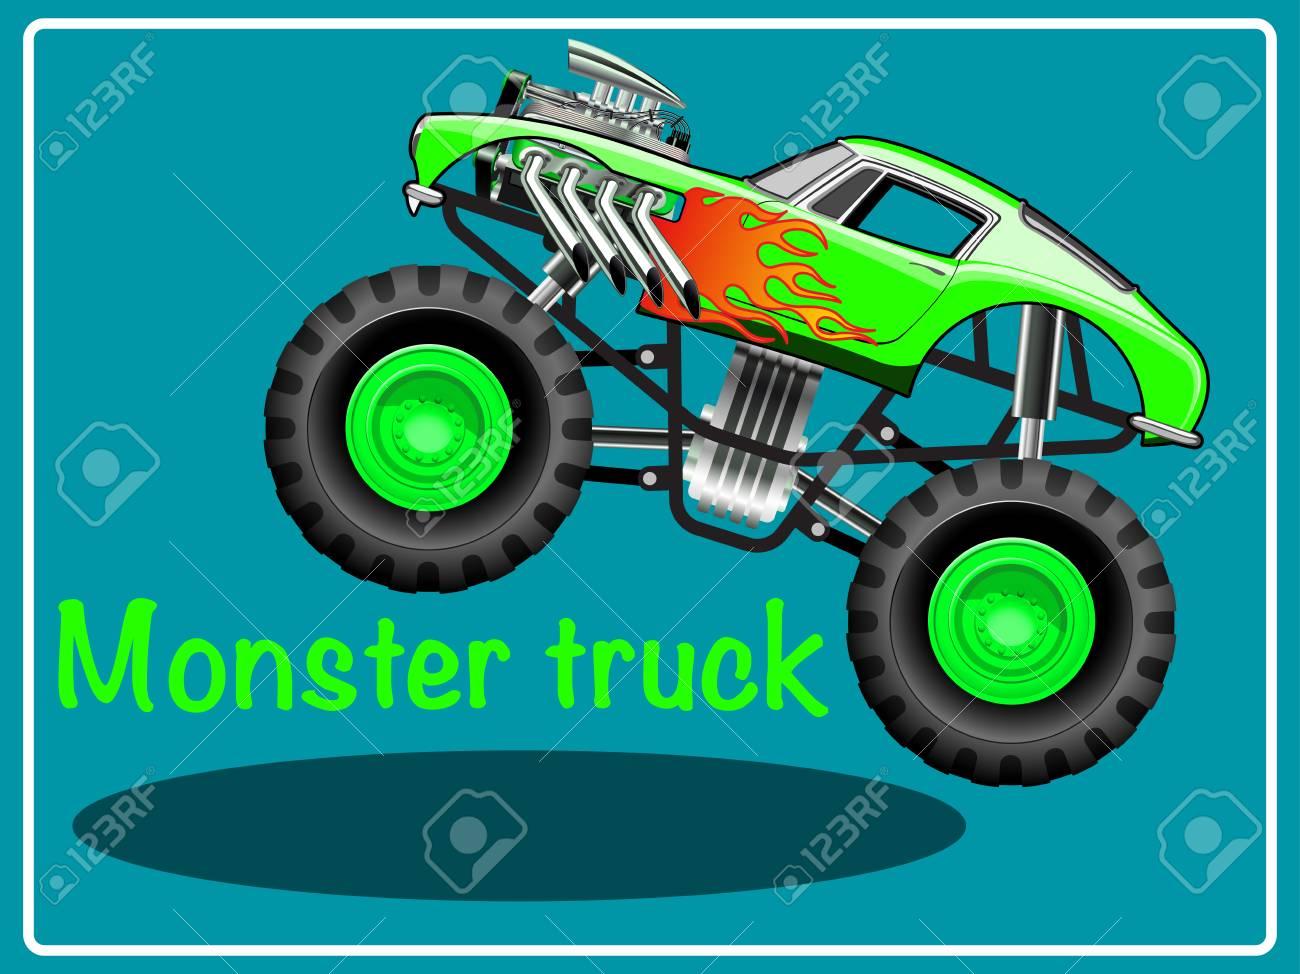 Cartoon Monster Truck Illustration Clip Art Royalty Free Cliparts Vectors And Stock Illustration Image 93146307